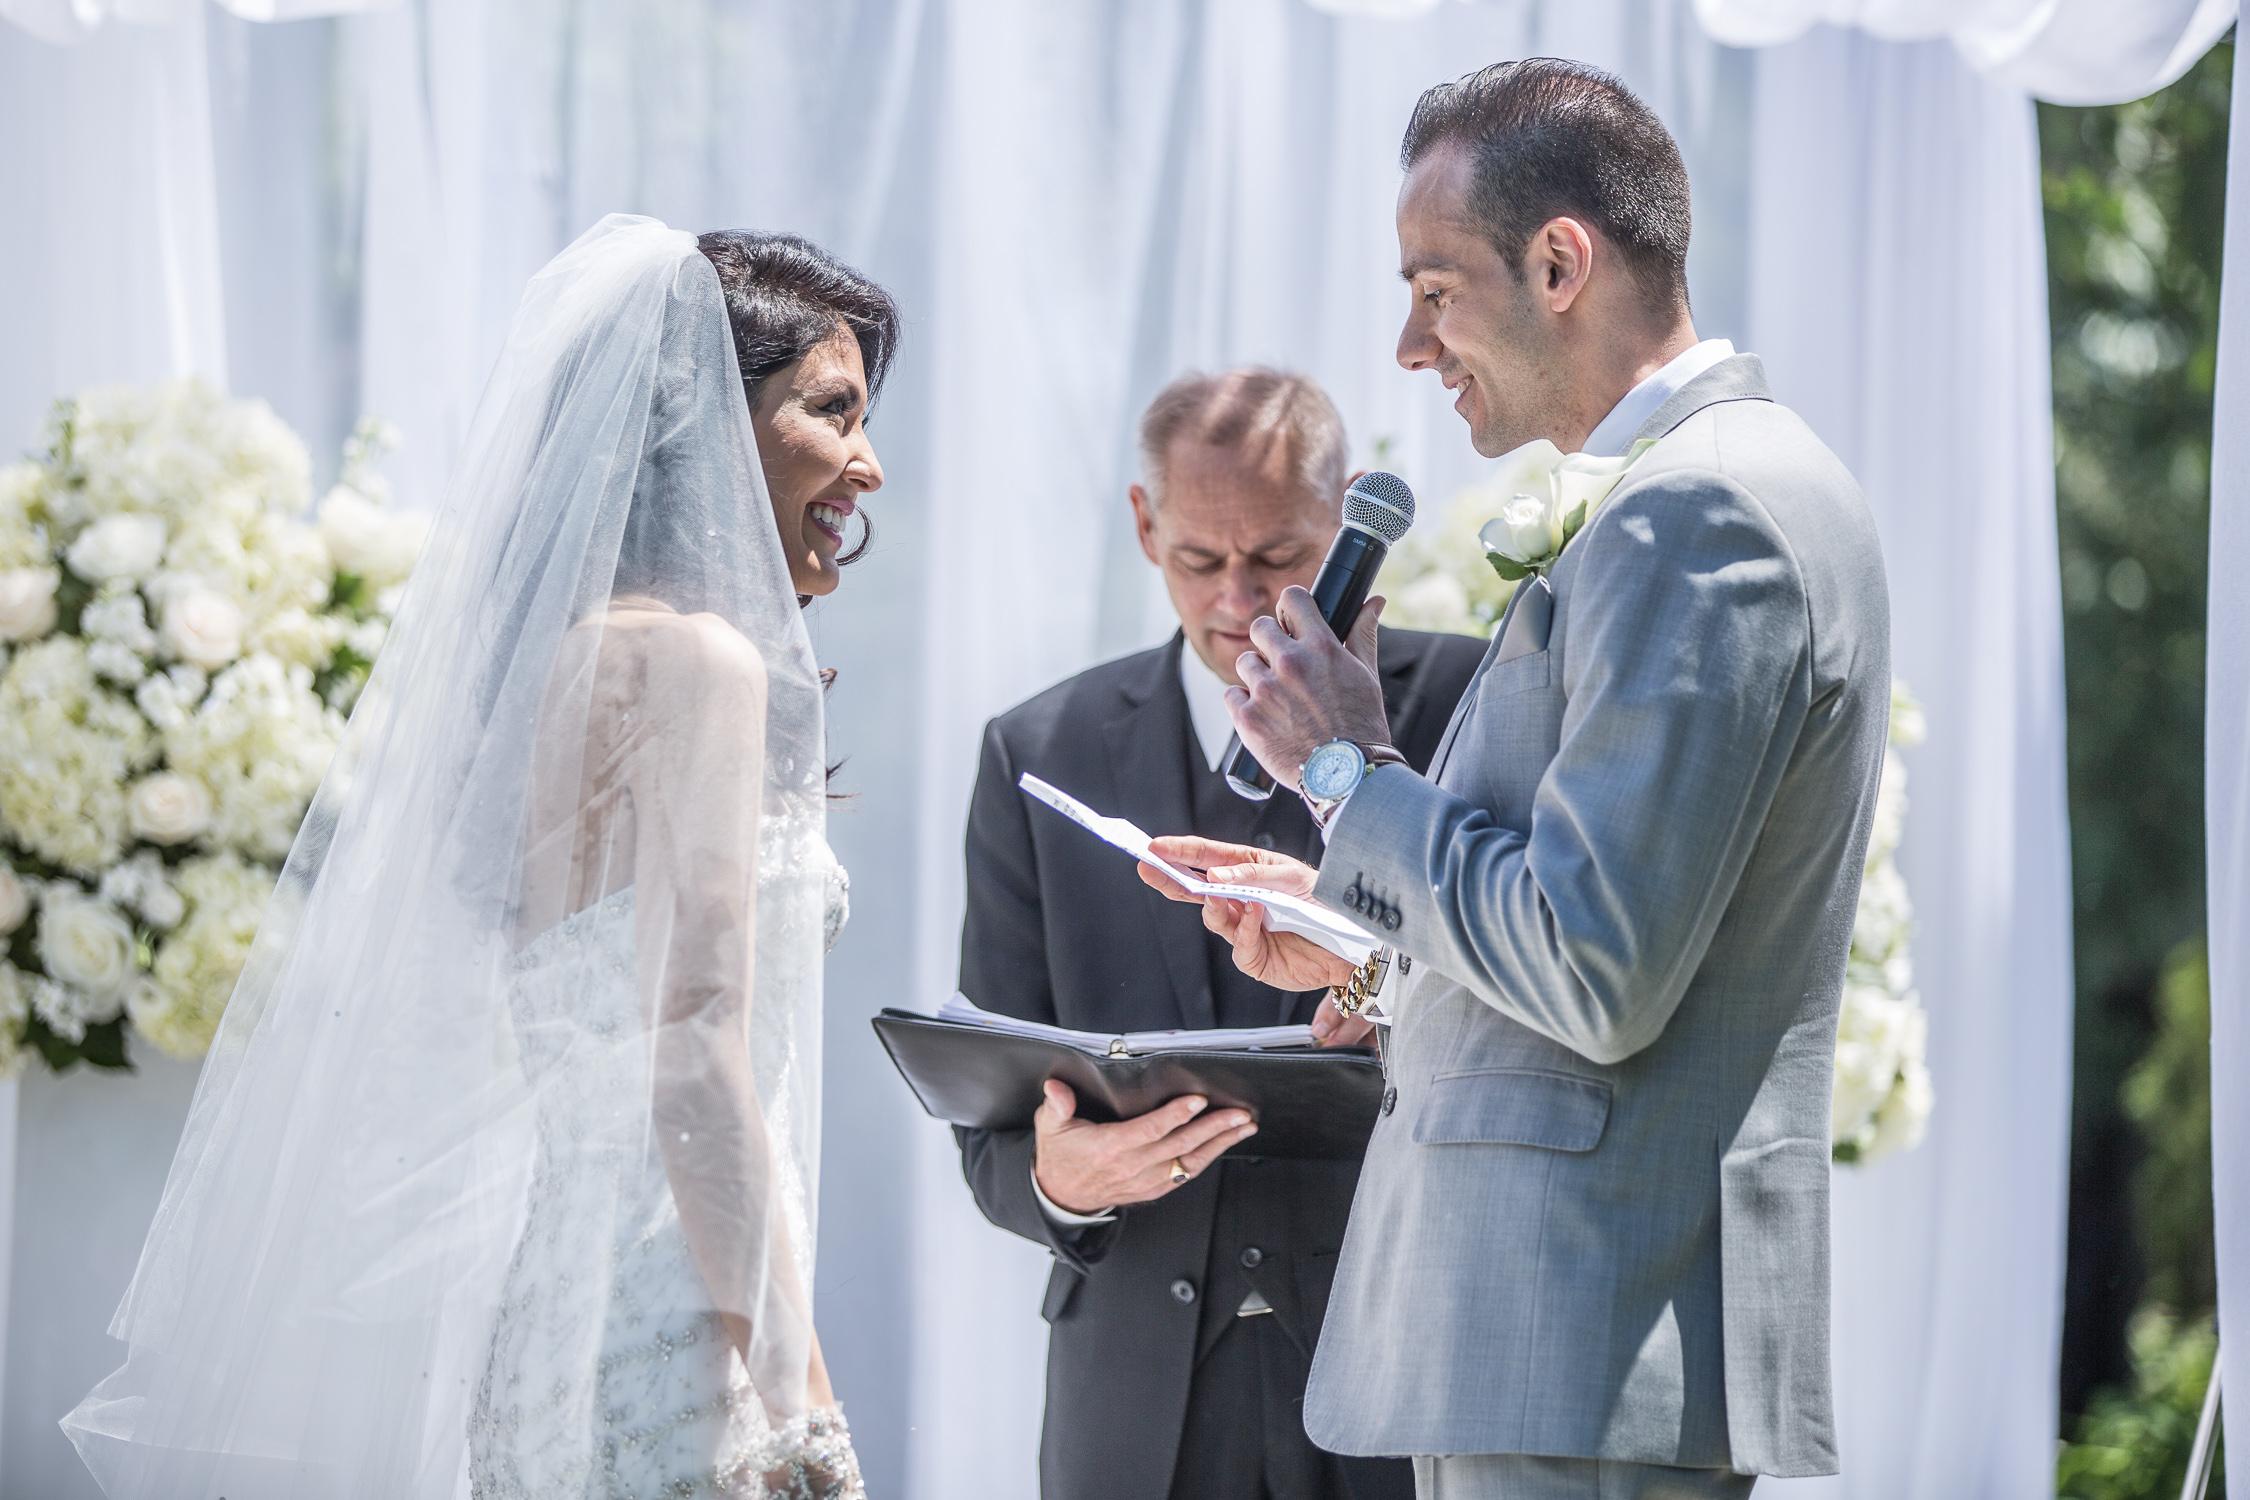 Paradise-Banquet-Hall-Wedding-Vaughan-Ontario-0044.jpg